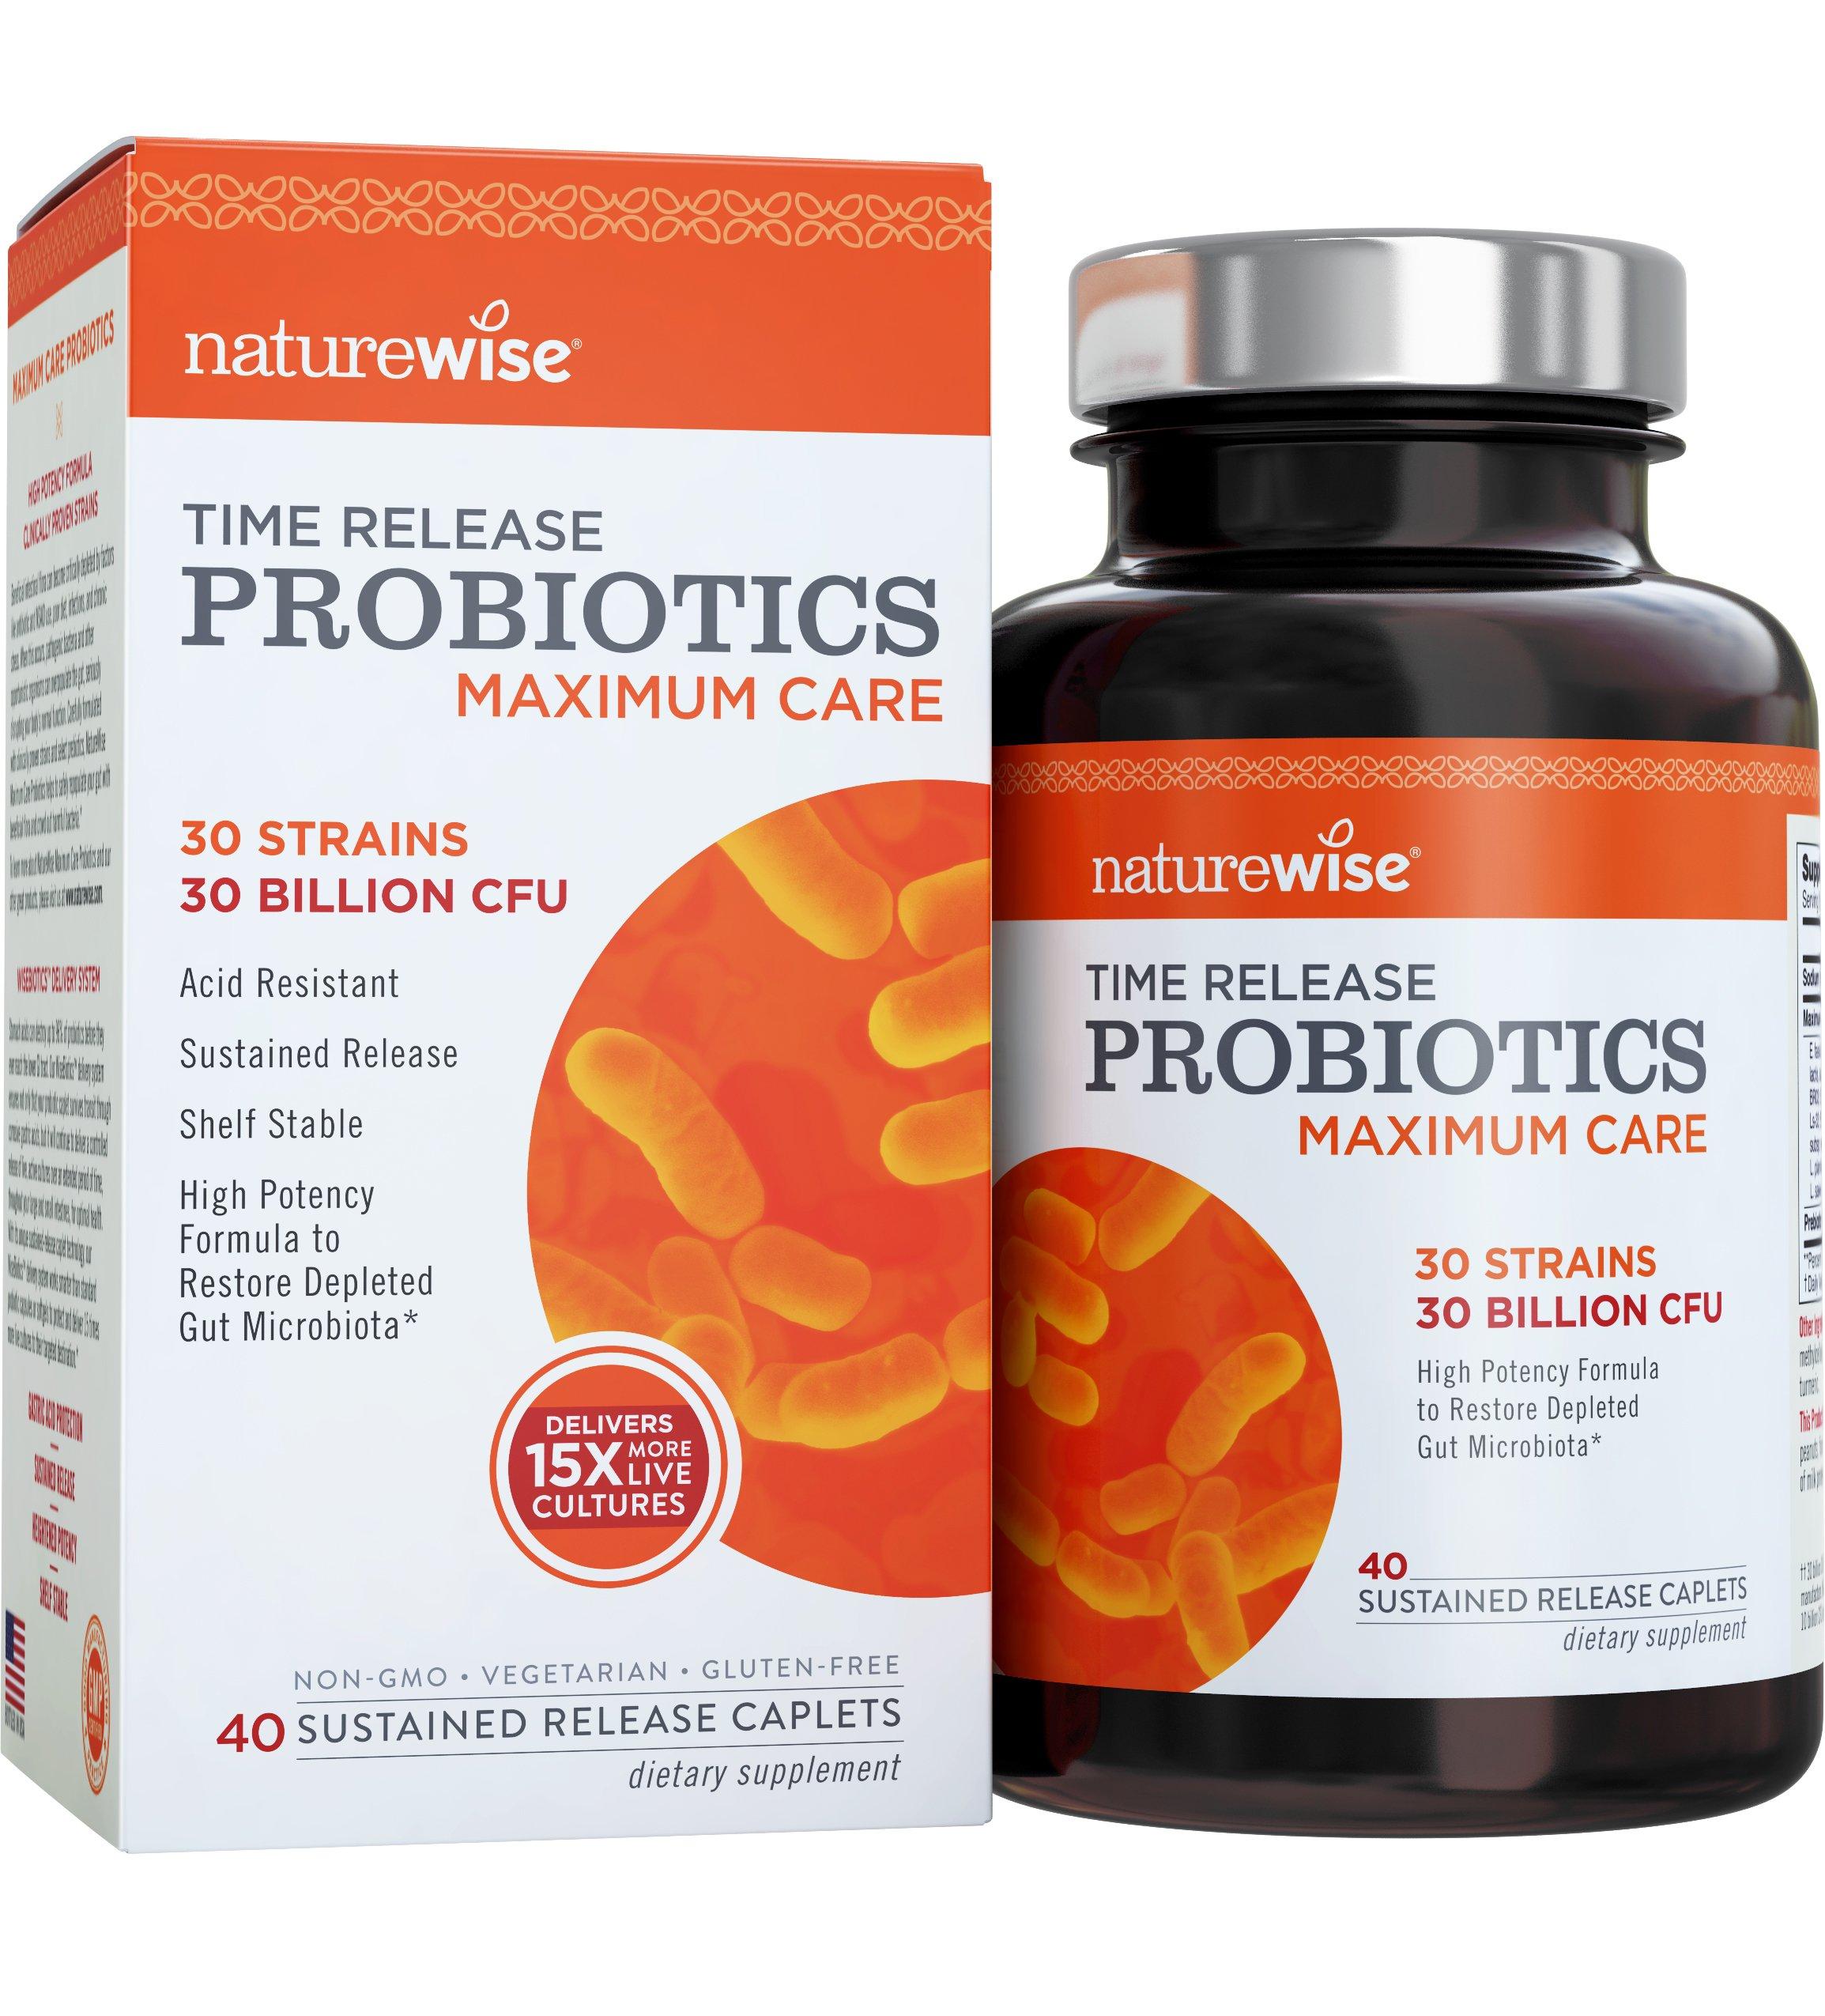 NatureWise Maximum Care Time-Release Probiotics for Men and Women: Comparable to 450 Billion CFU Probiotic Supplement, High Potency, 30 Strains, 40 Caplets